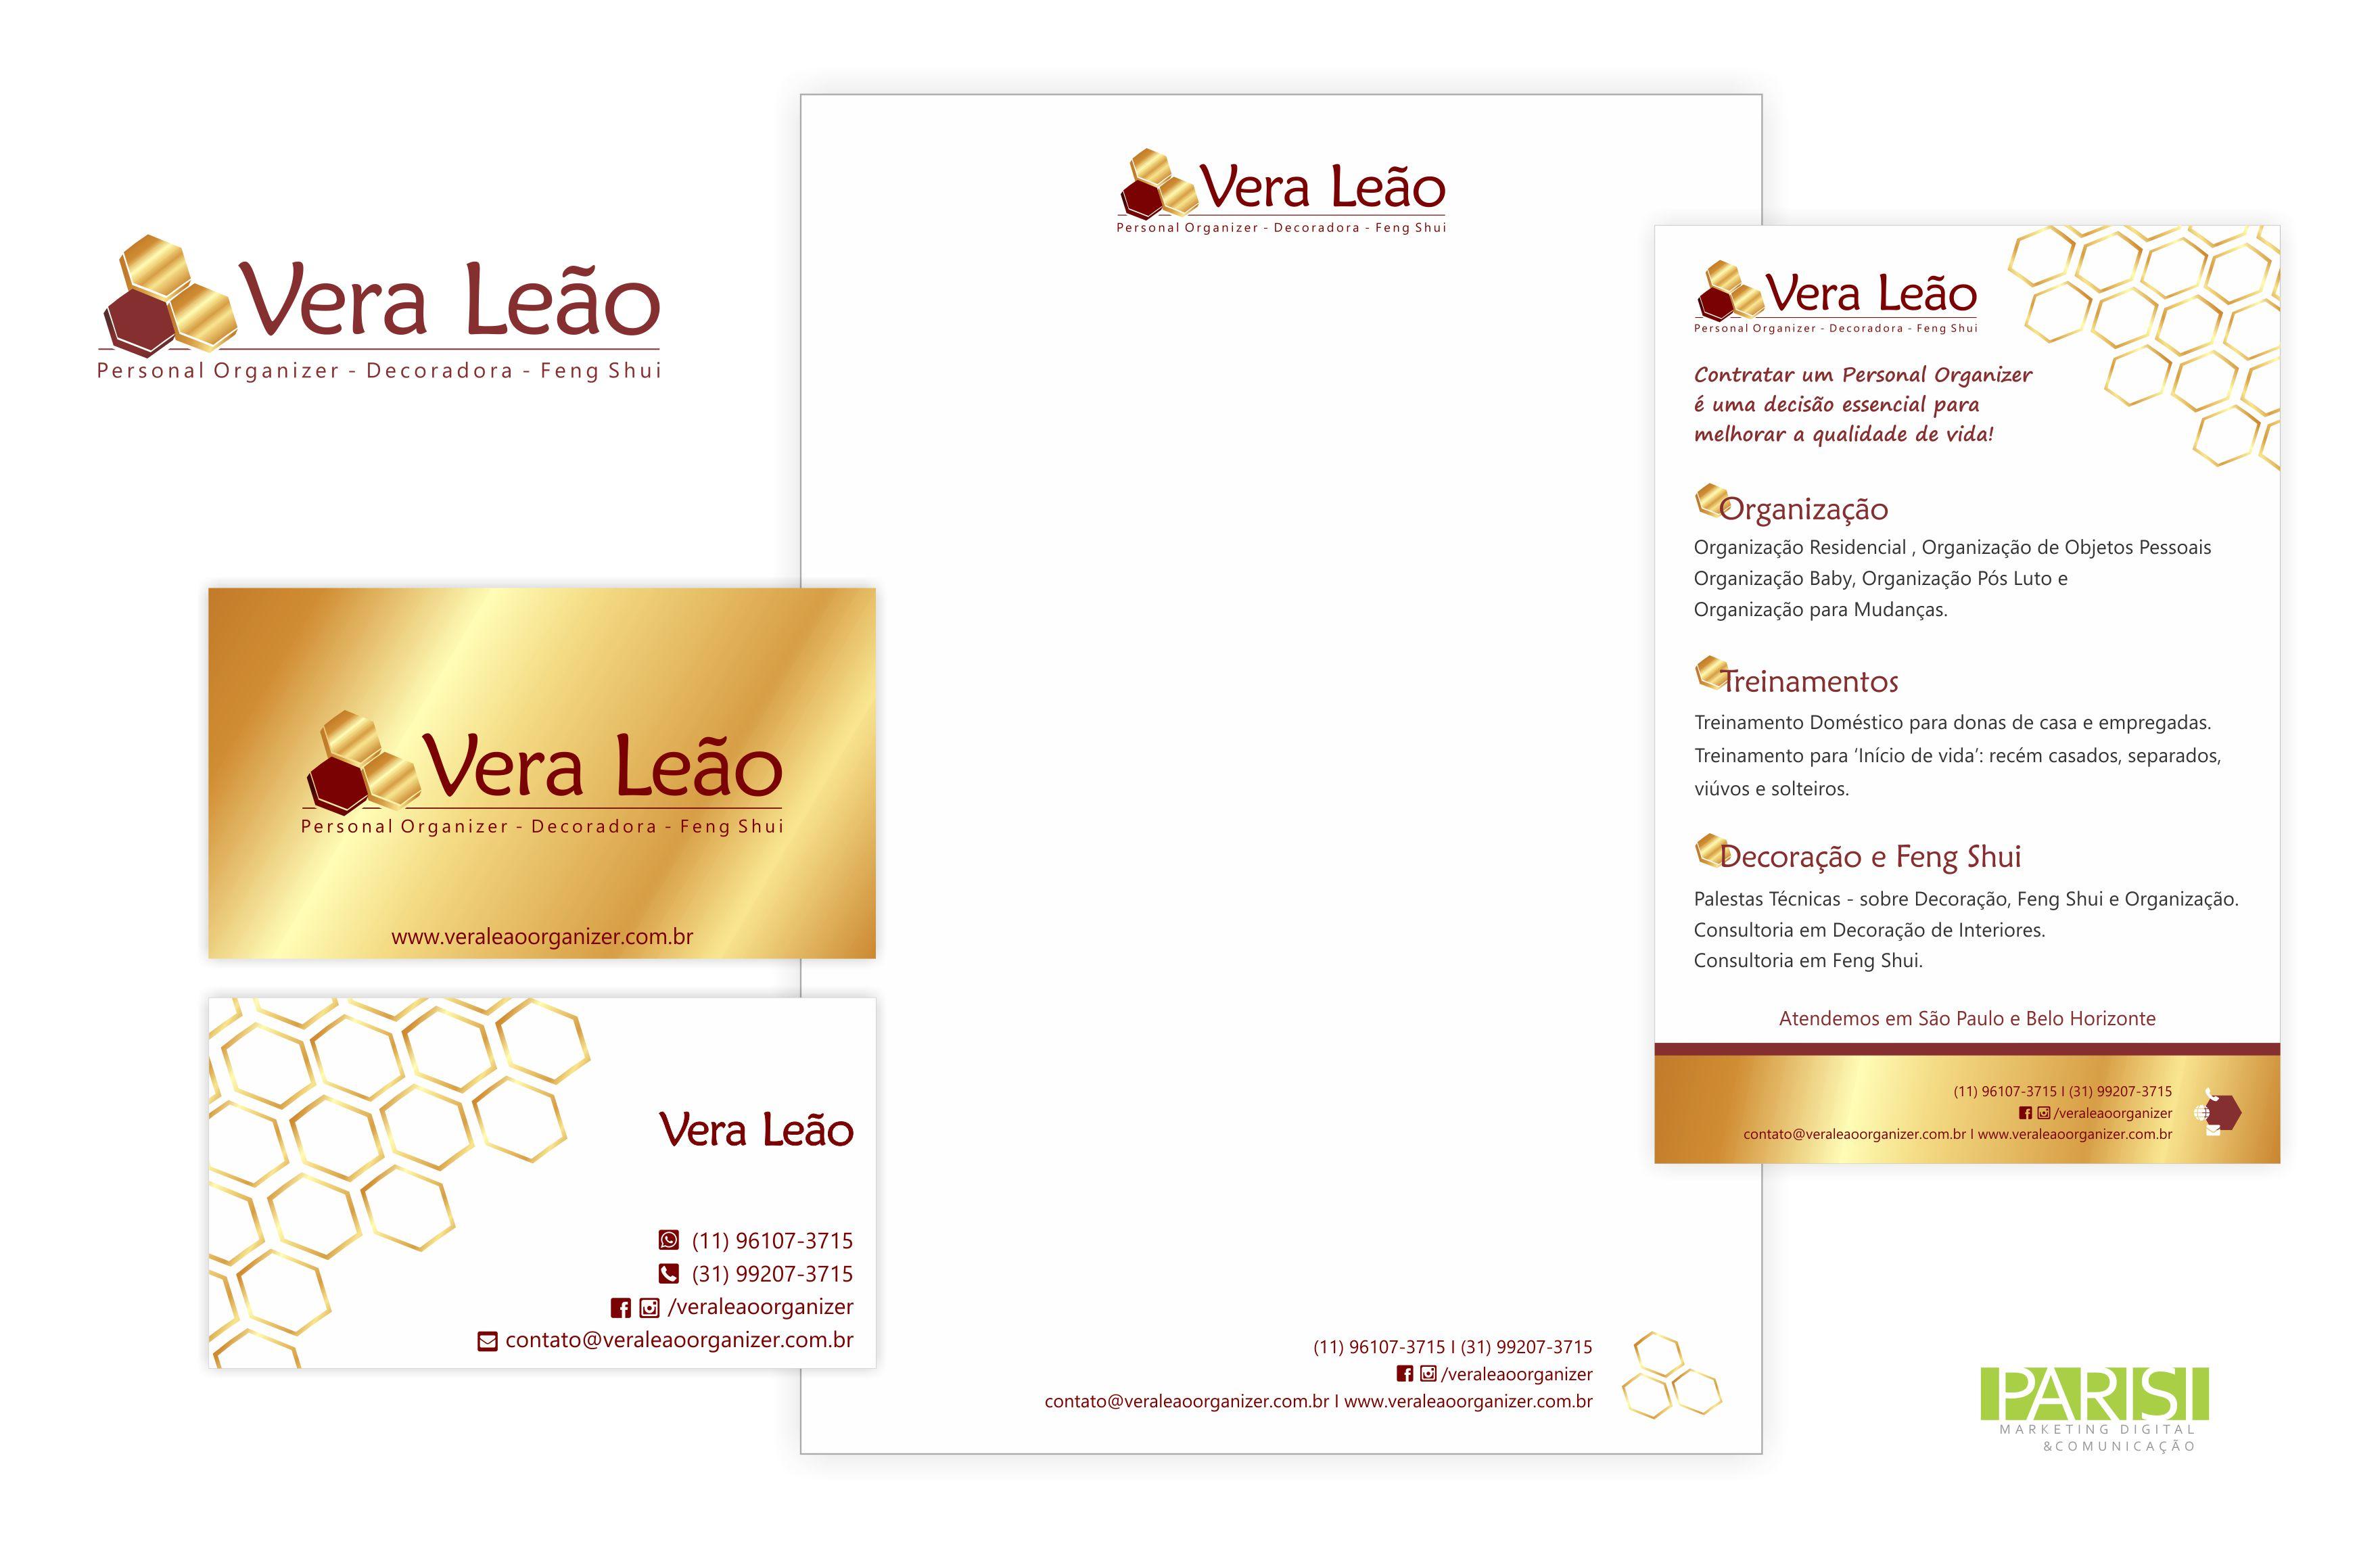 Identidade Visual - Vera Leão